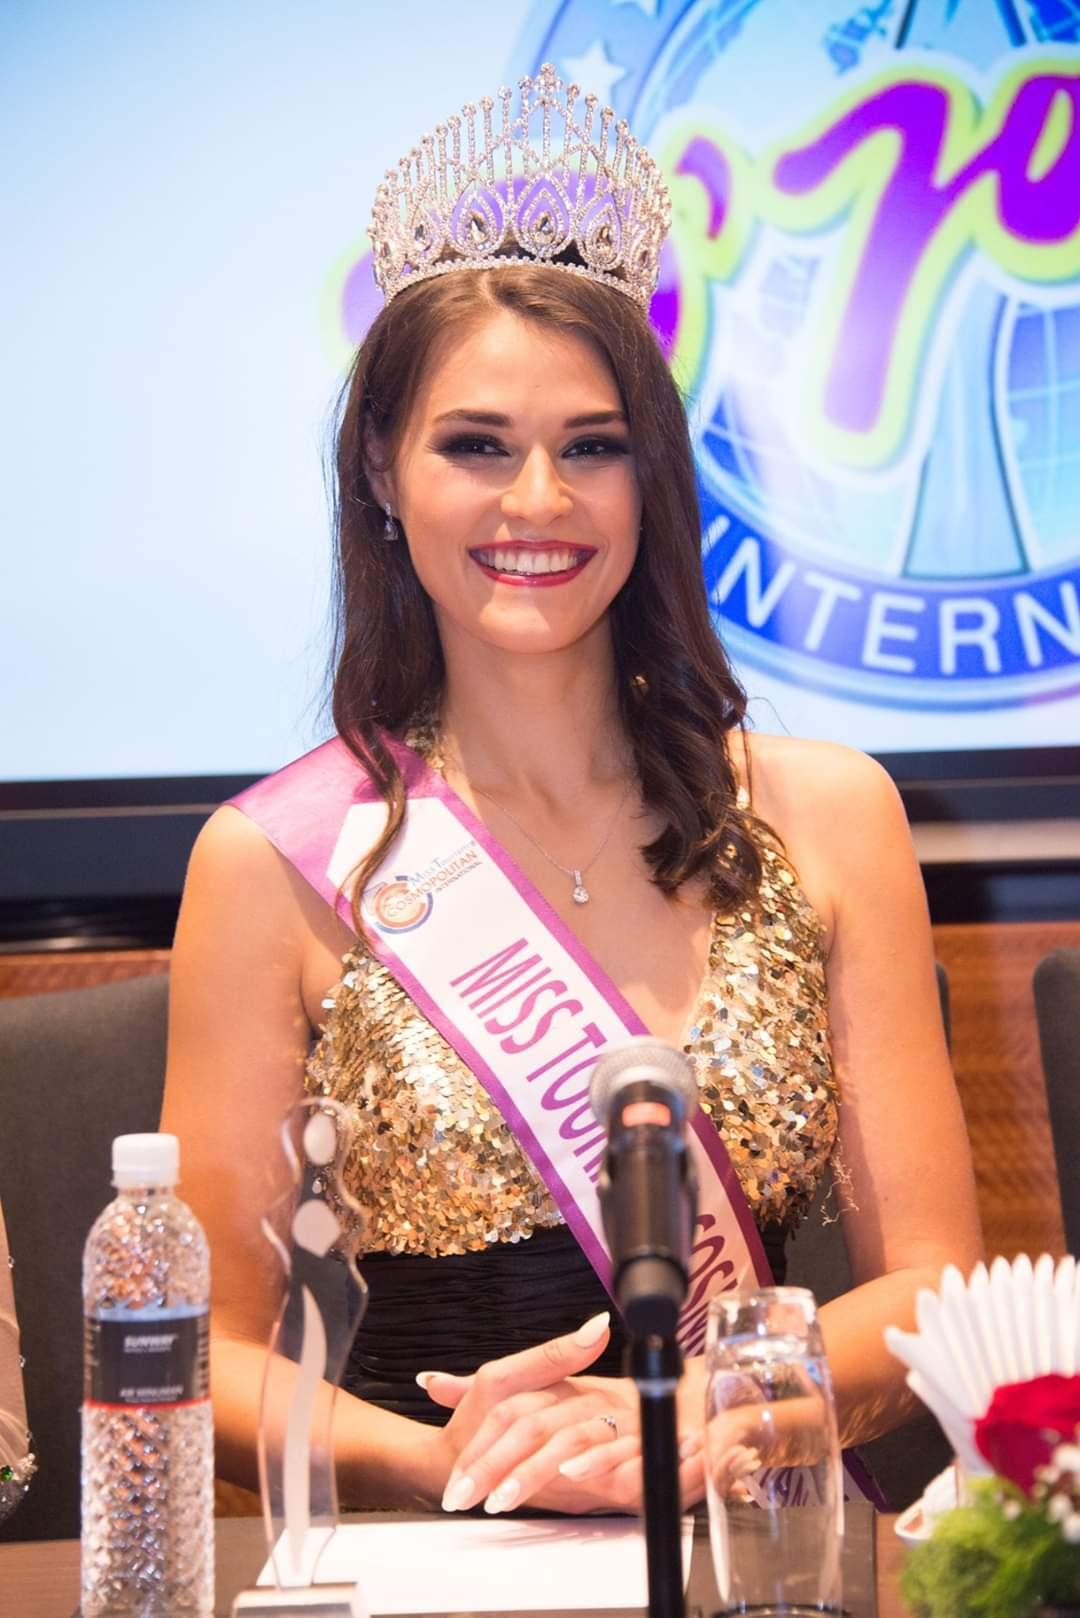 Joanna Babynko – Miss Tourism International Poland 2019